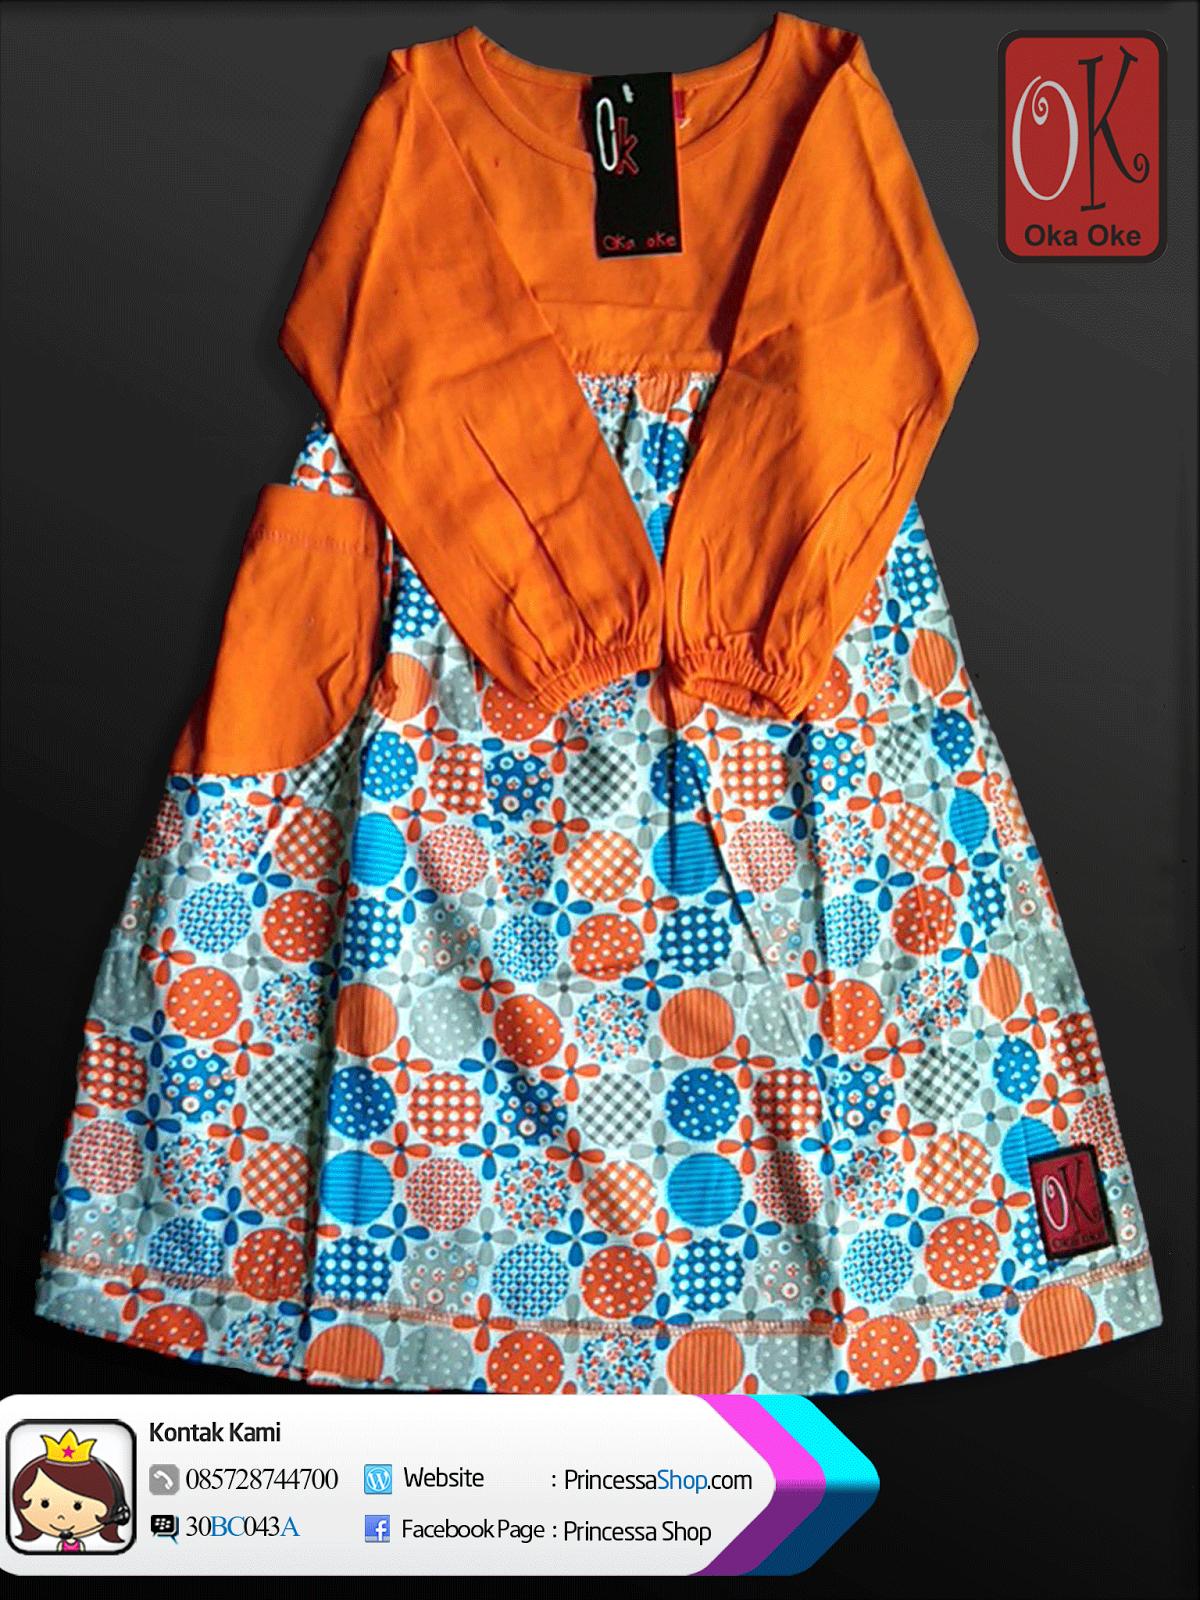 Baju Gamis Produksi Konveksi Oka Oke